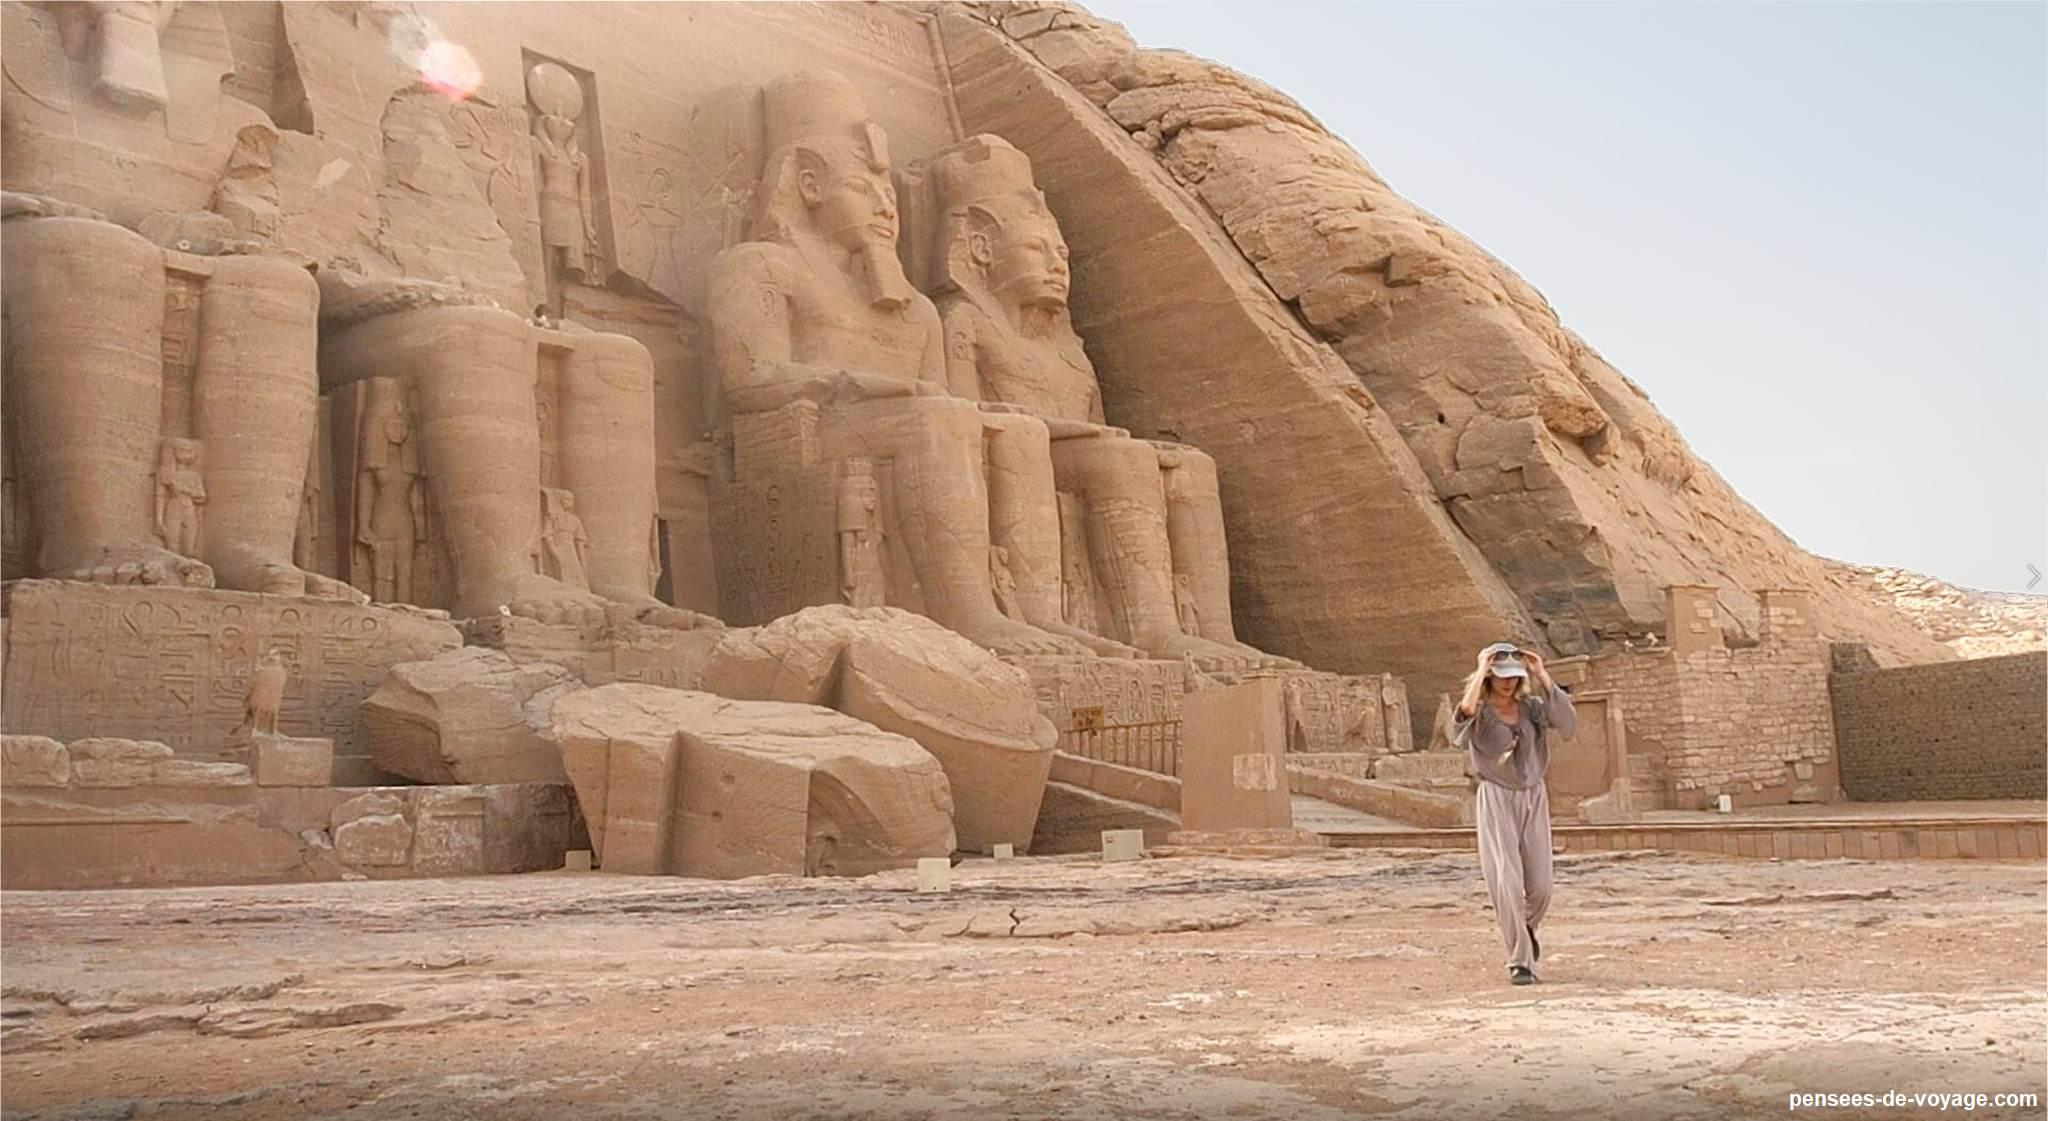 Visite seule du temple d'Abu Simbel